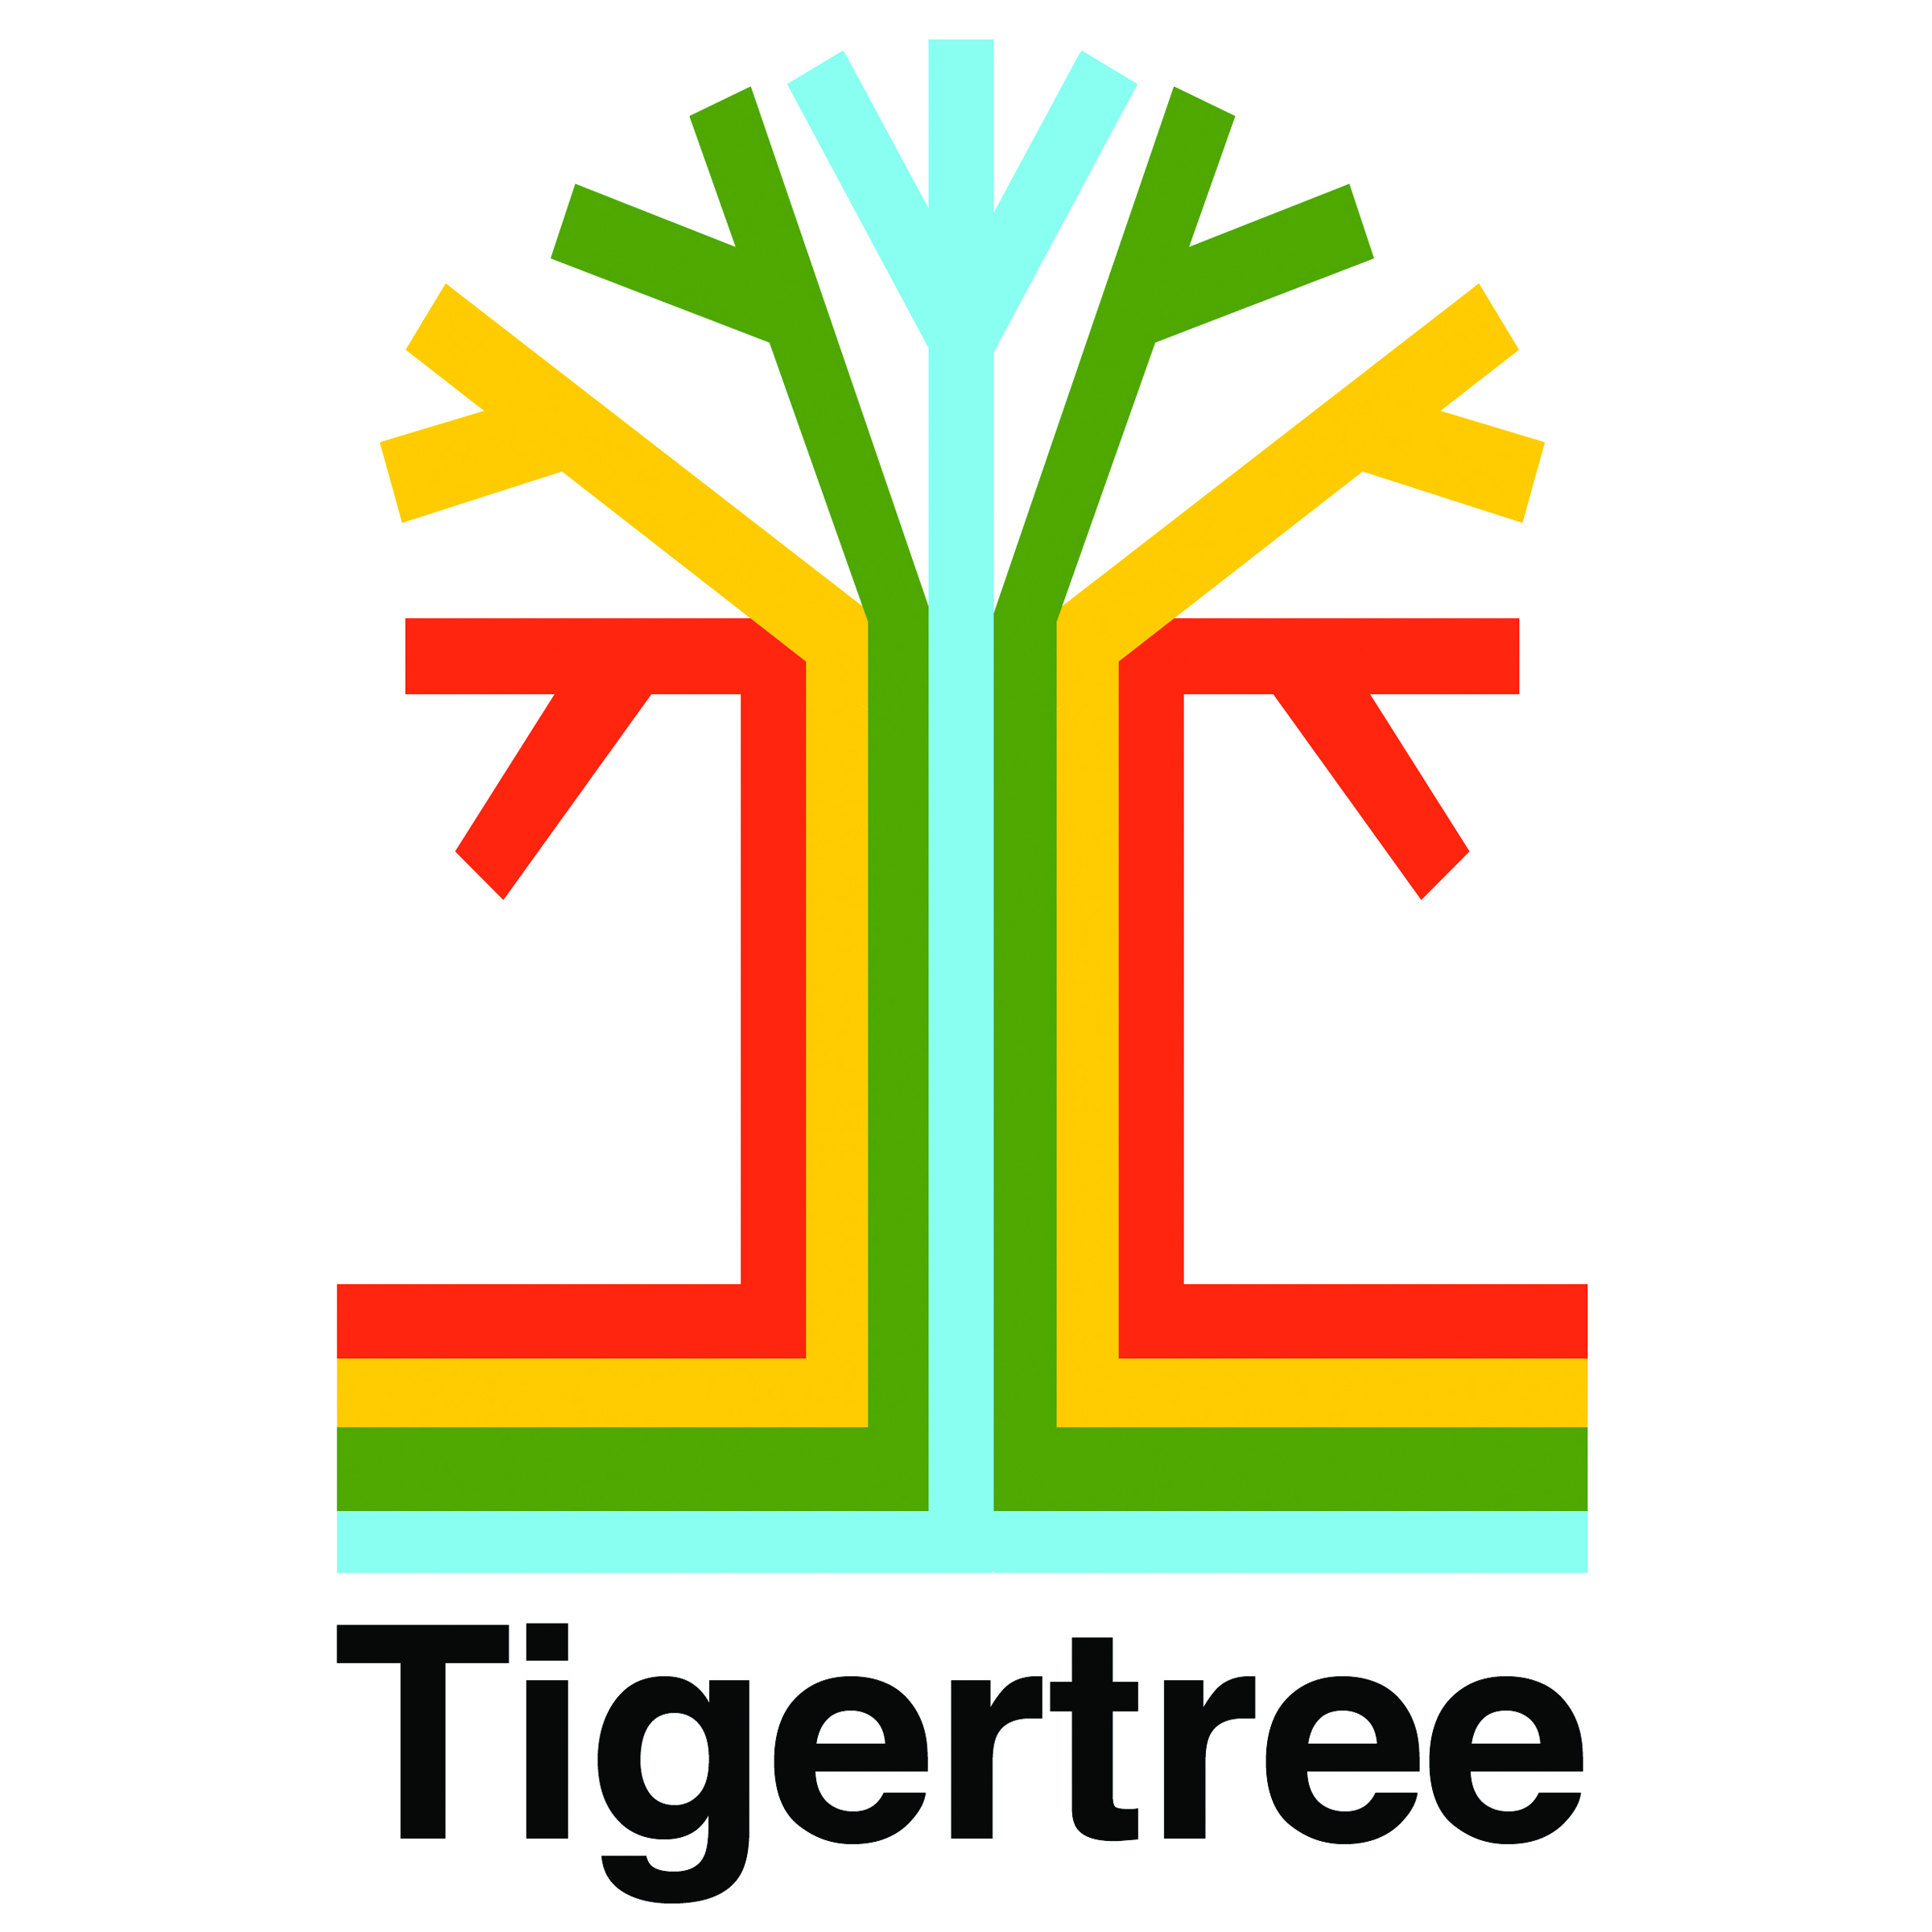 tigertree clothing accessories and gifts rh shoptigertree com Realtree Logo Fashion Company Logos